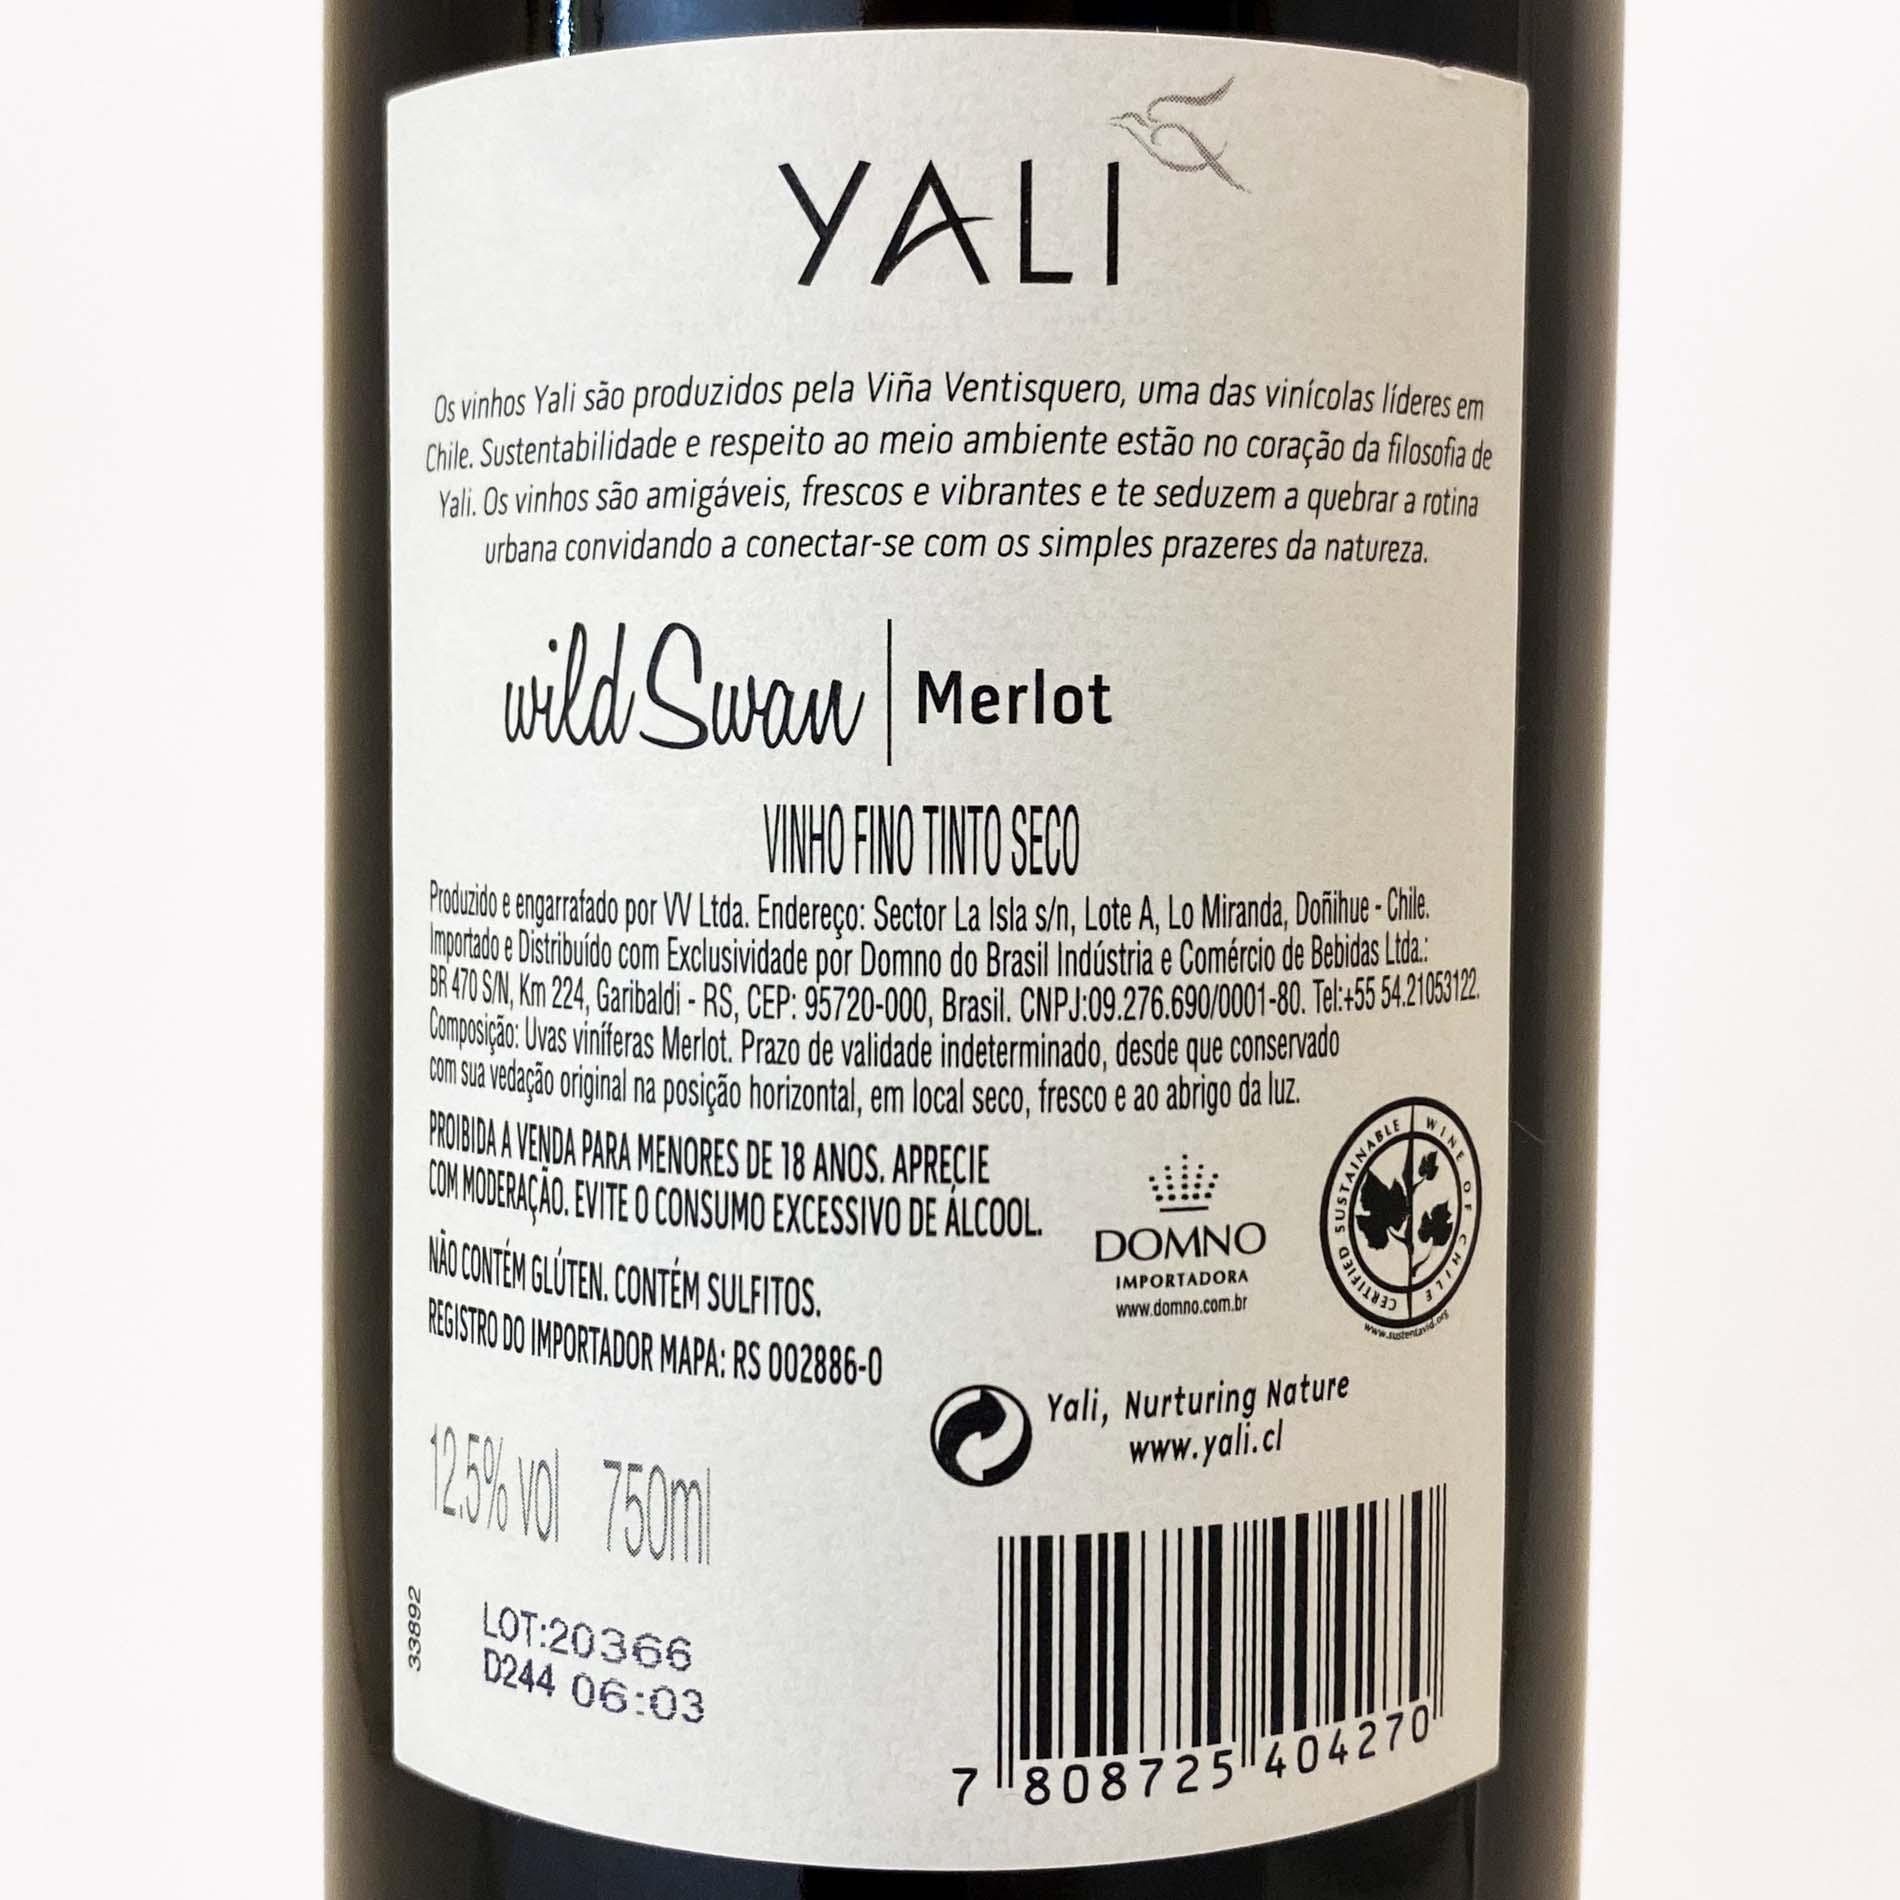 Yali - Wild Swan Merlot  - Vinerize